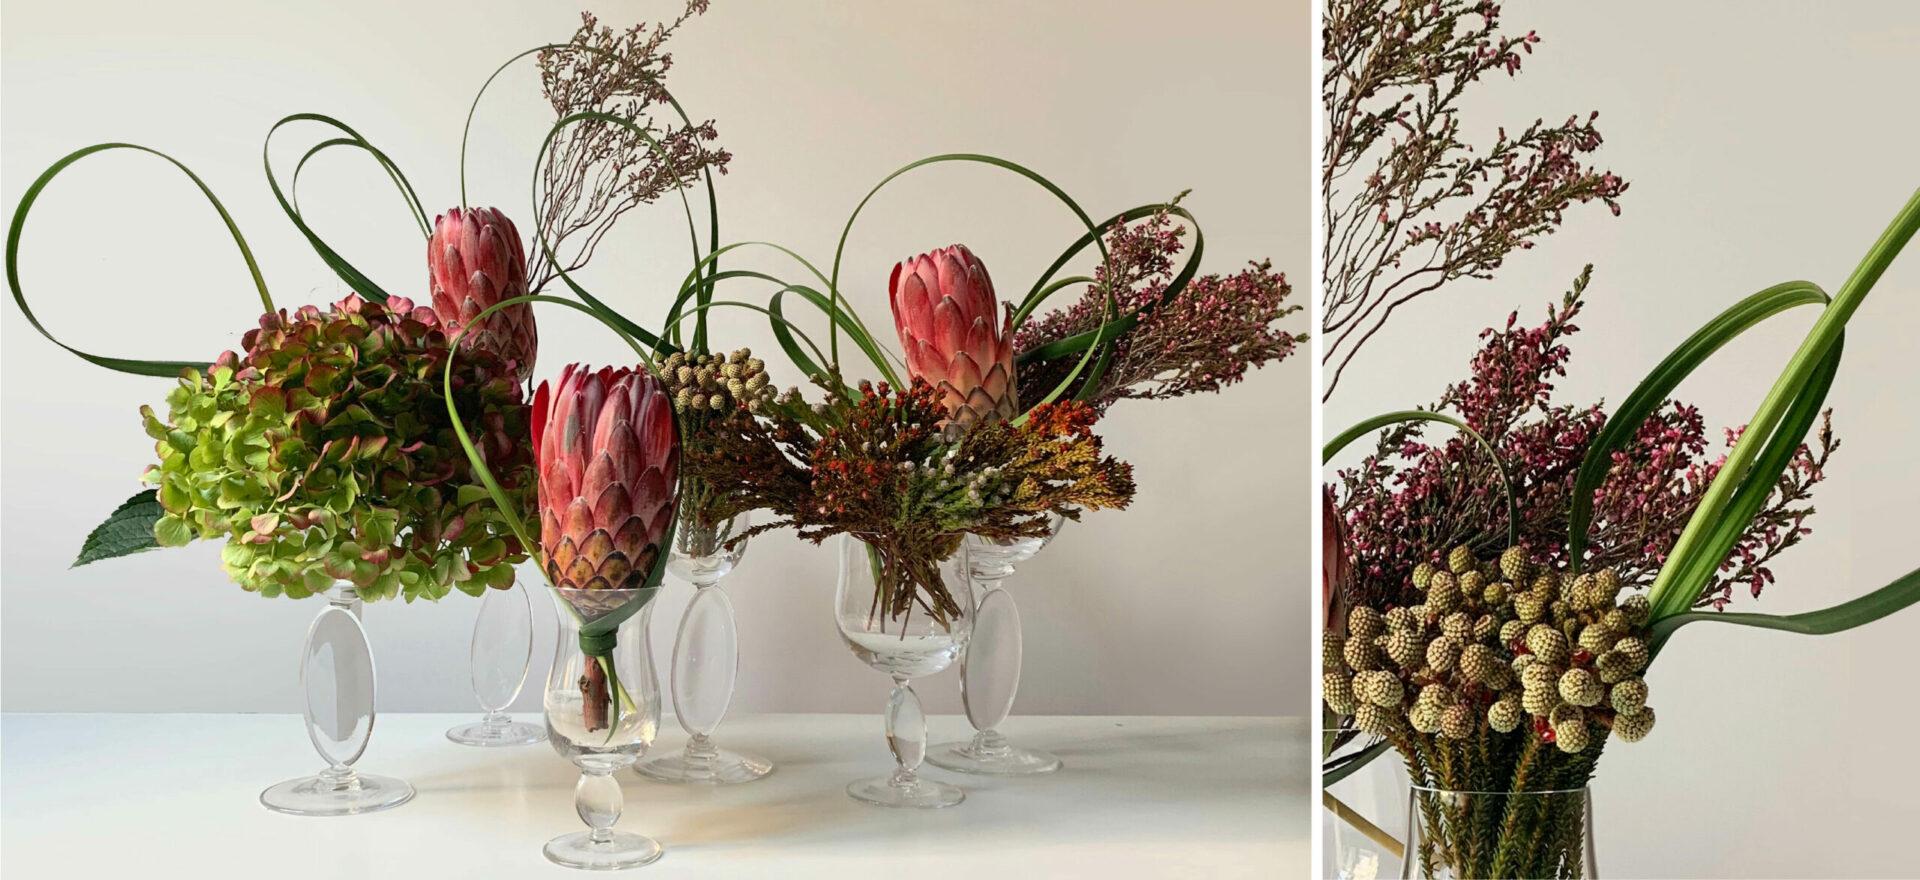 Drops_Paşabahçe_Omnia_glassware design_Flower design_Mario Trimarchi Design_Products Artworks